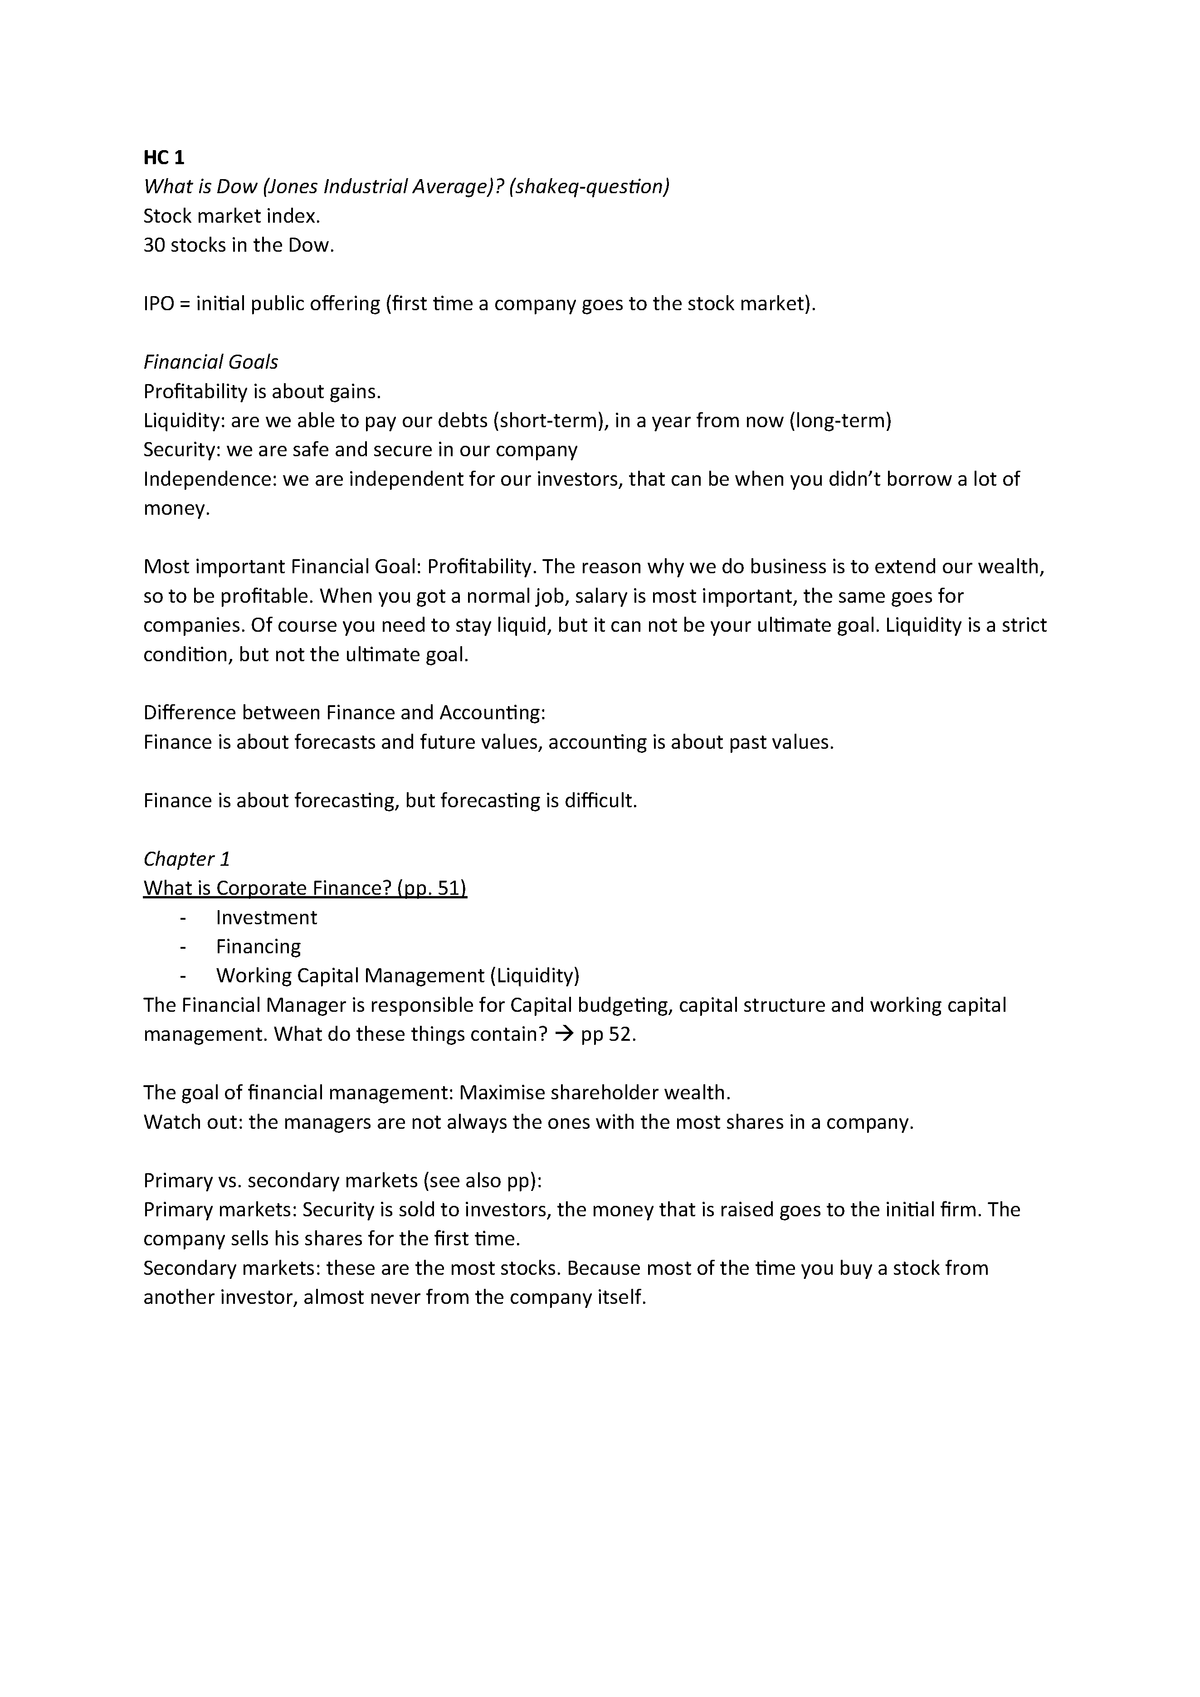 HC 1 - aantekeningen - MAN-BCU2020: Corporate Finance - StuDocu